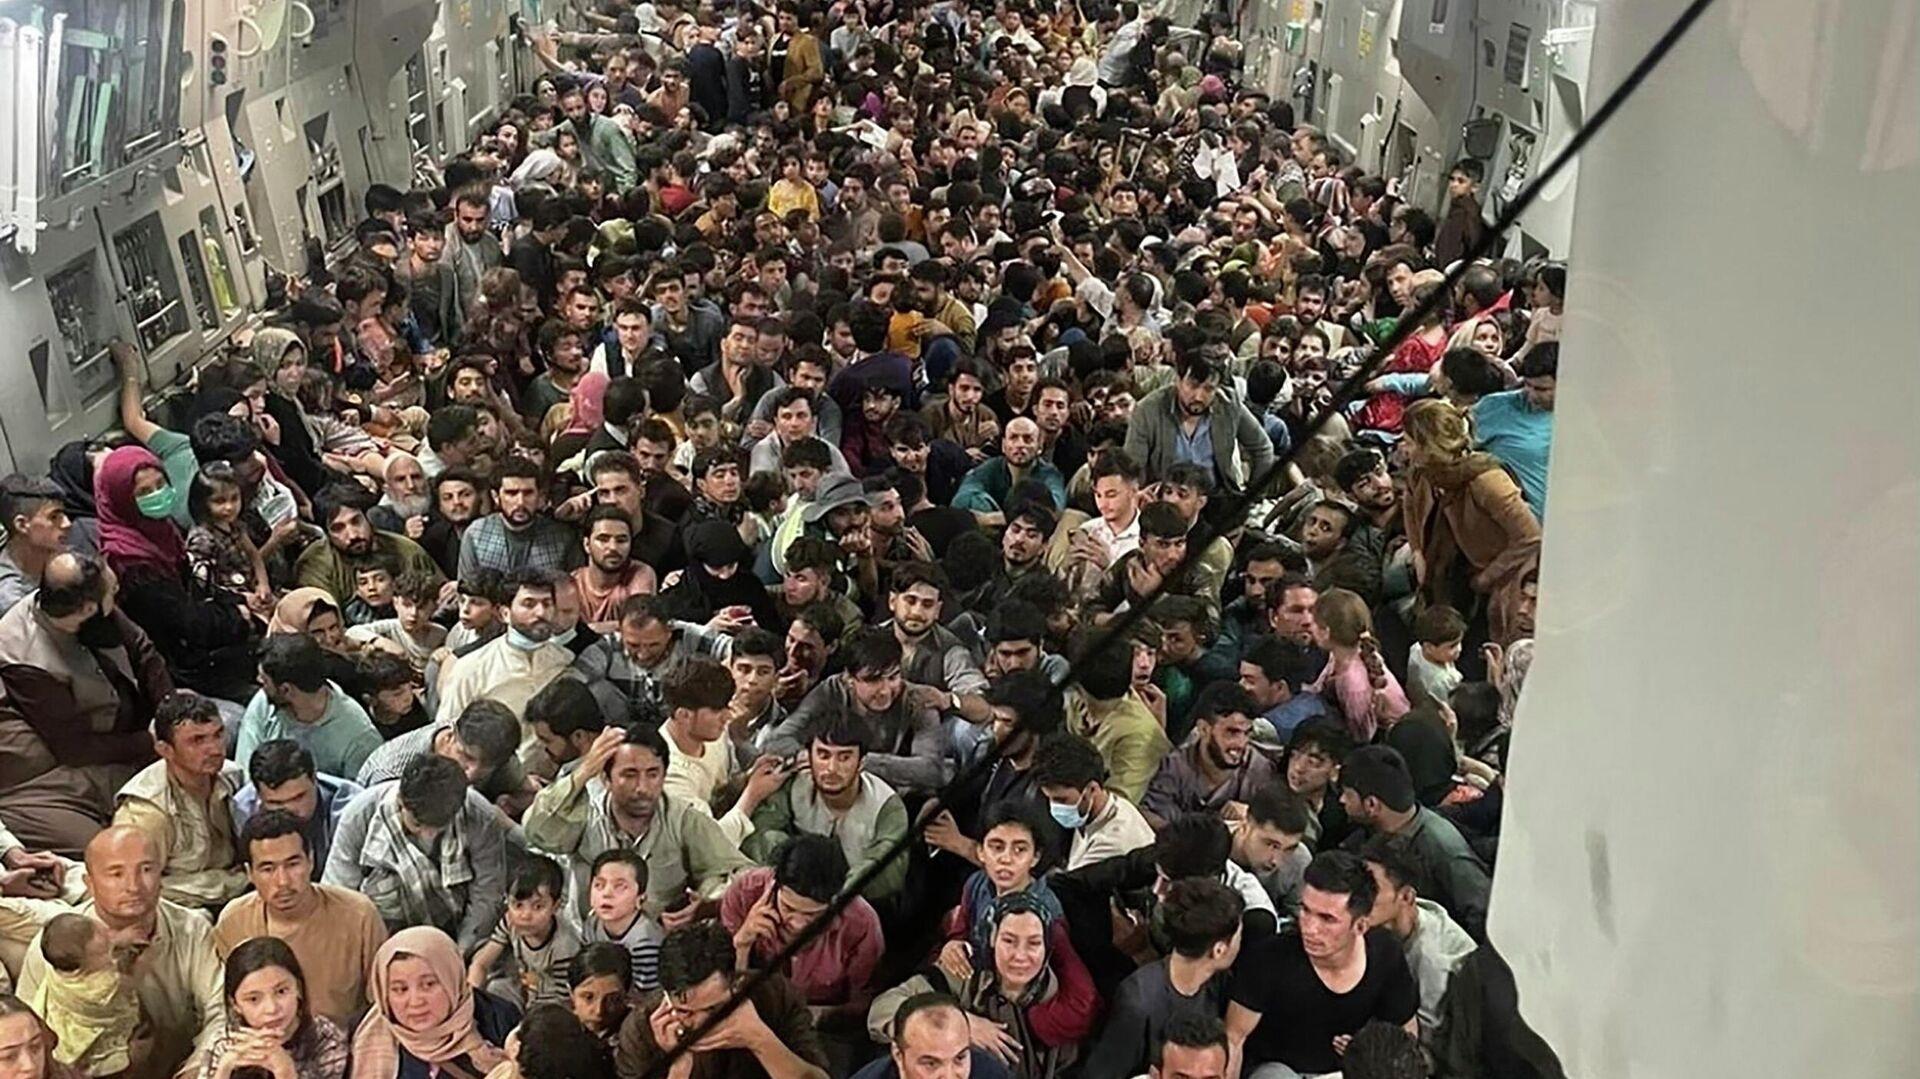 Беженцы из Афганистана в самолете - Sputnik Таджикистан, 1920, 11.10.2021